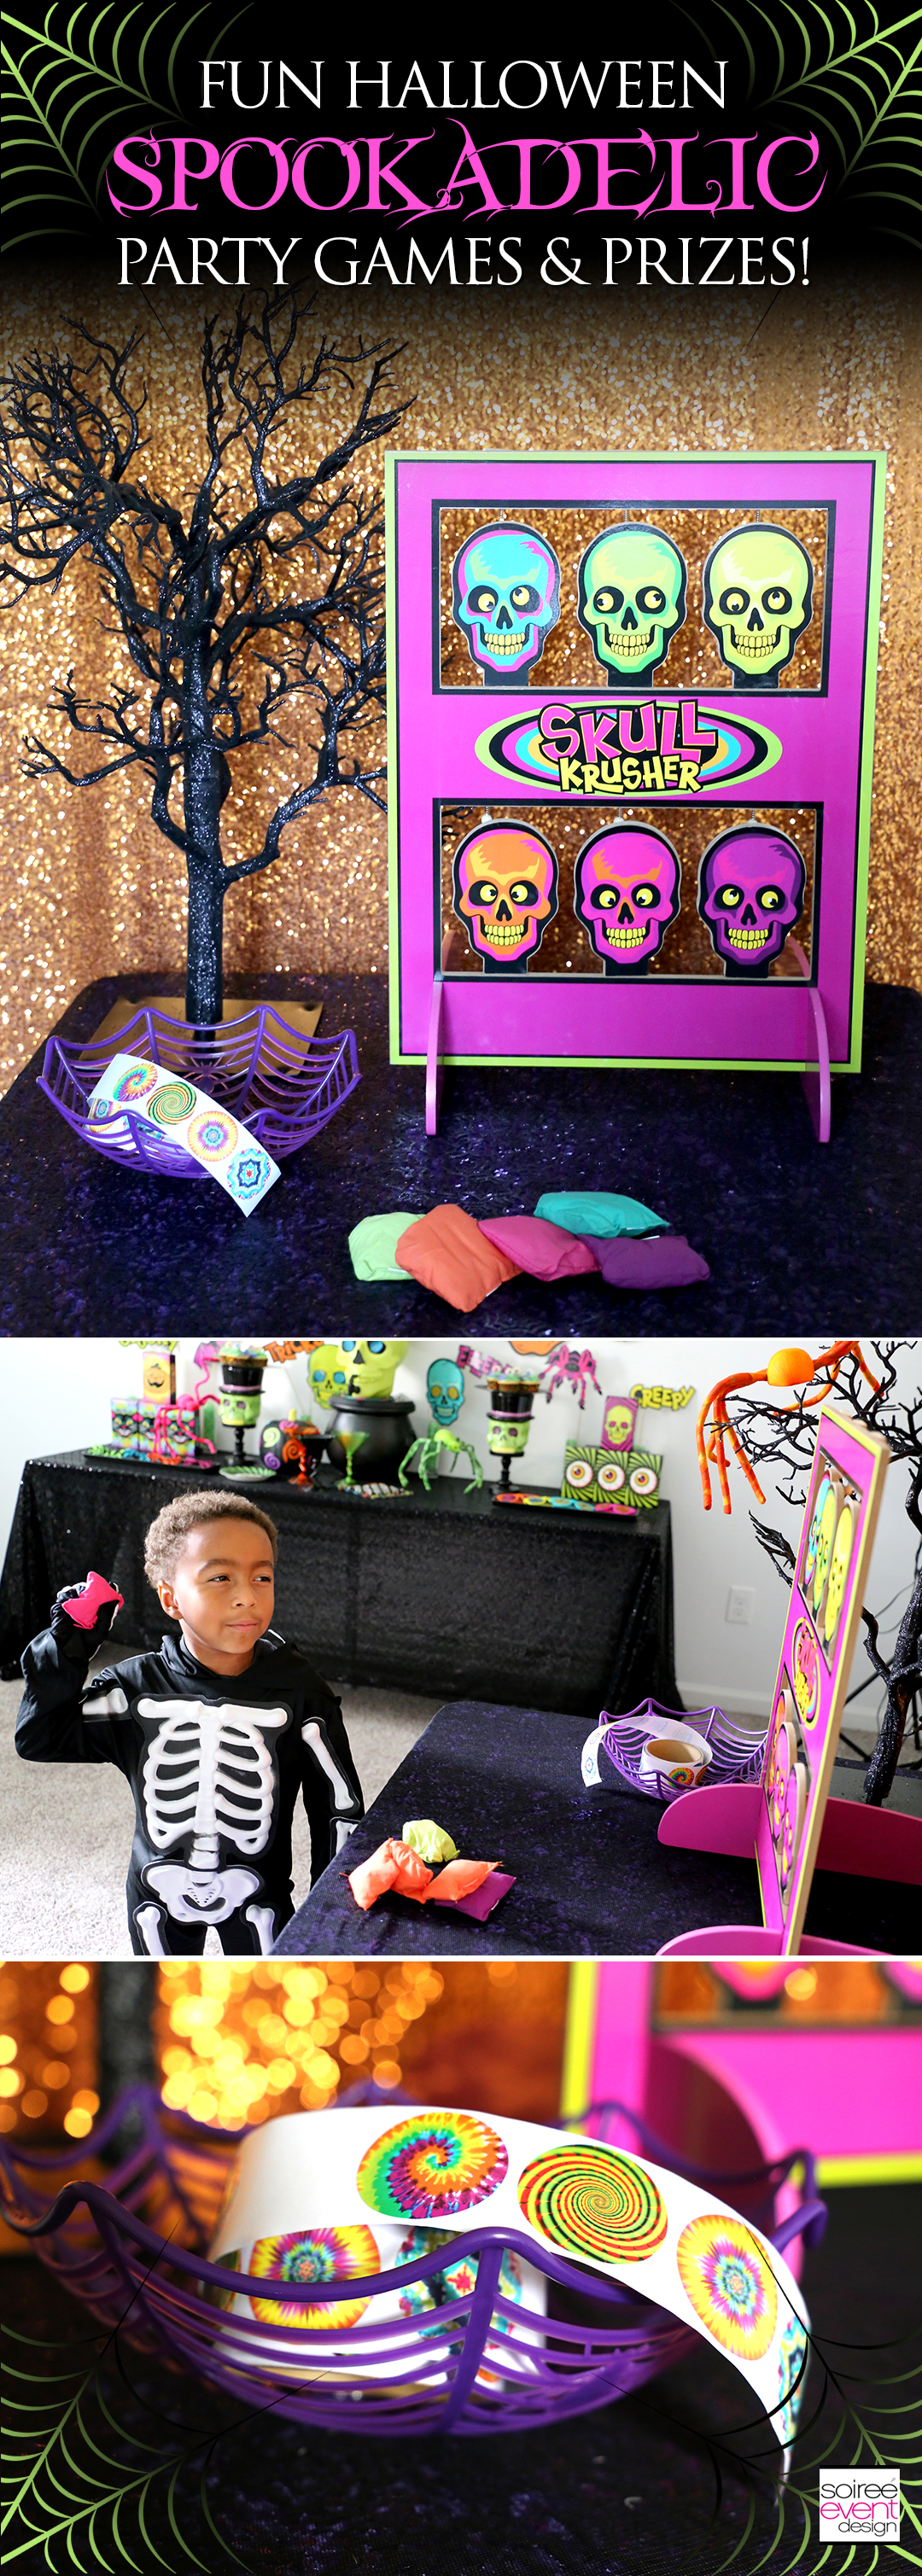 Spookadelic Halloween Party Games